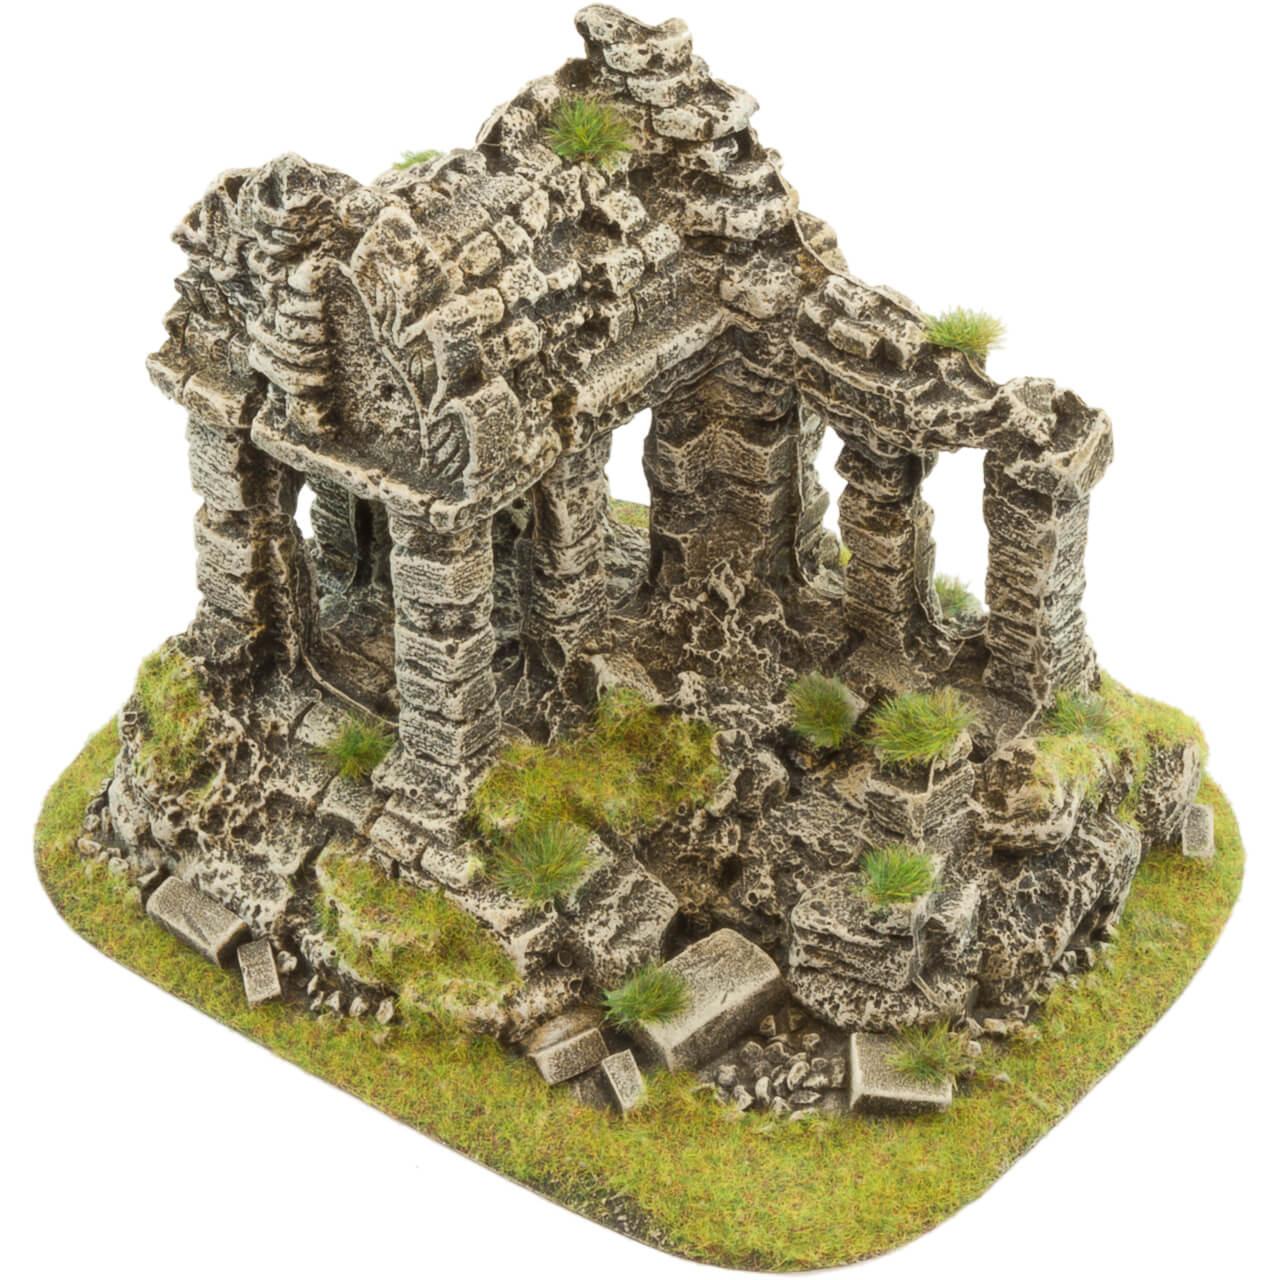 1. Produktabbildung - Kleine Angkor Ruine